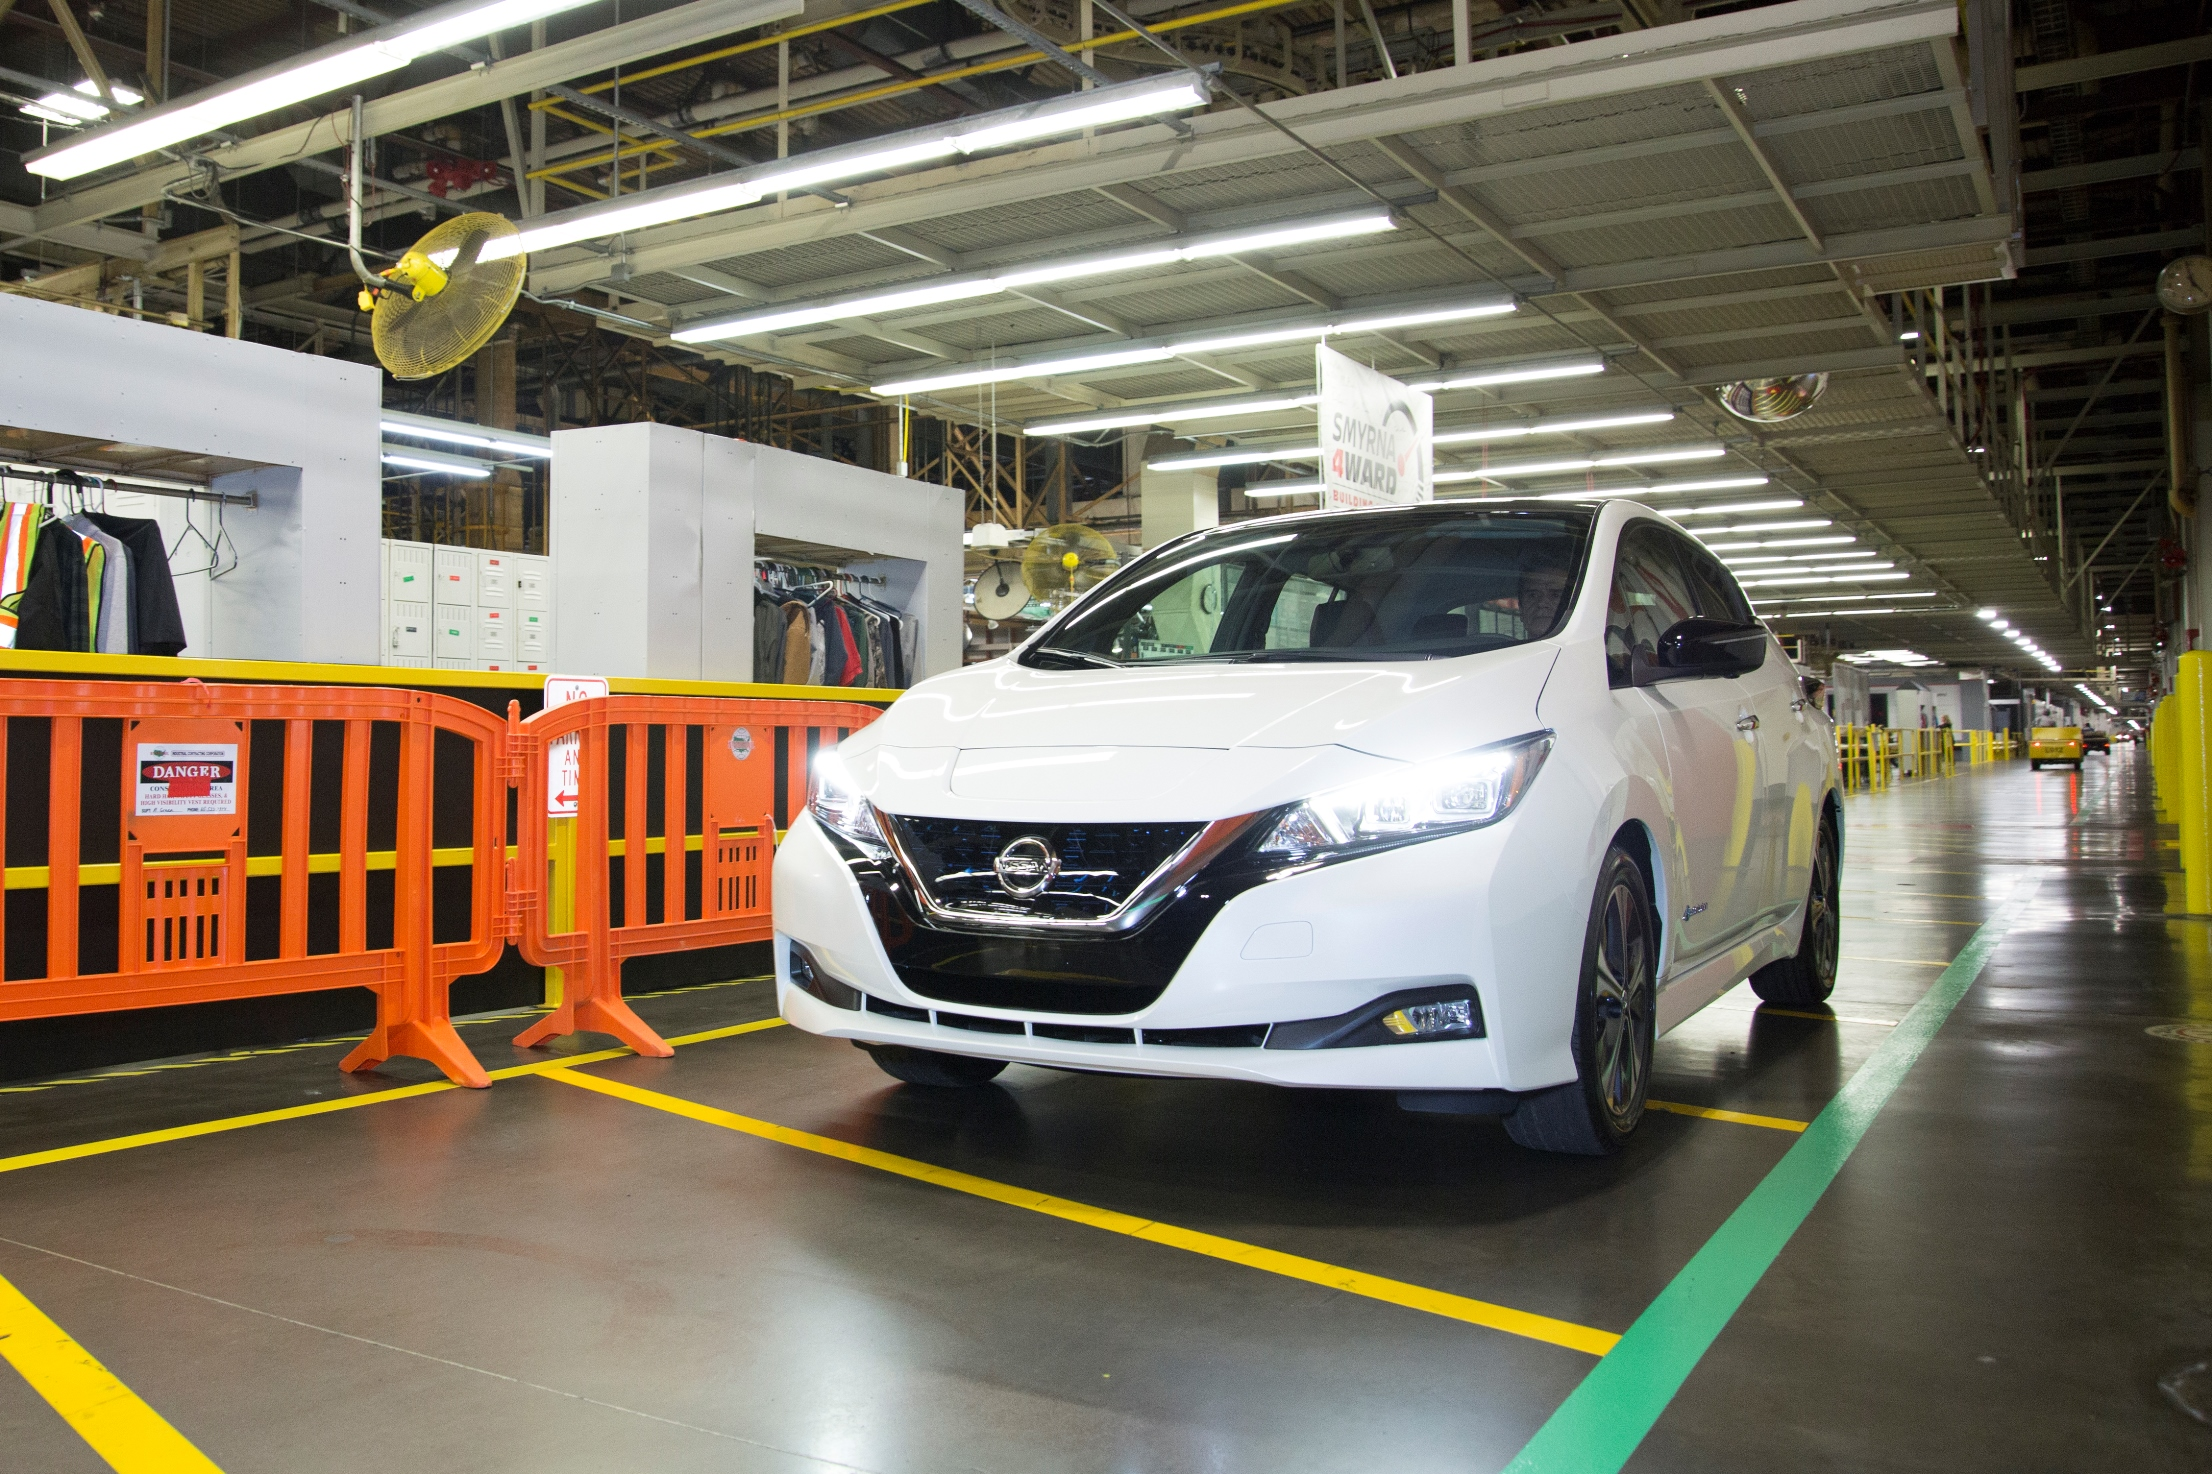 Nissan Smyrna Tn Jobs >> U S Spec 2018 Nissan Leaf Starts Production In Smyrna Tennessee